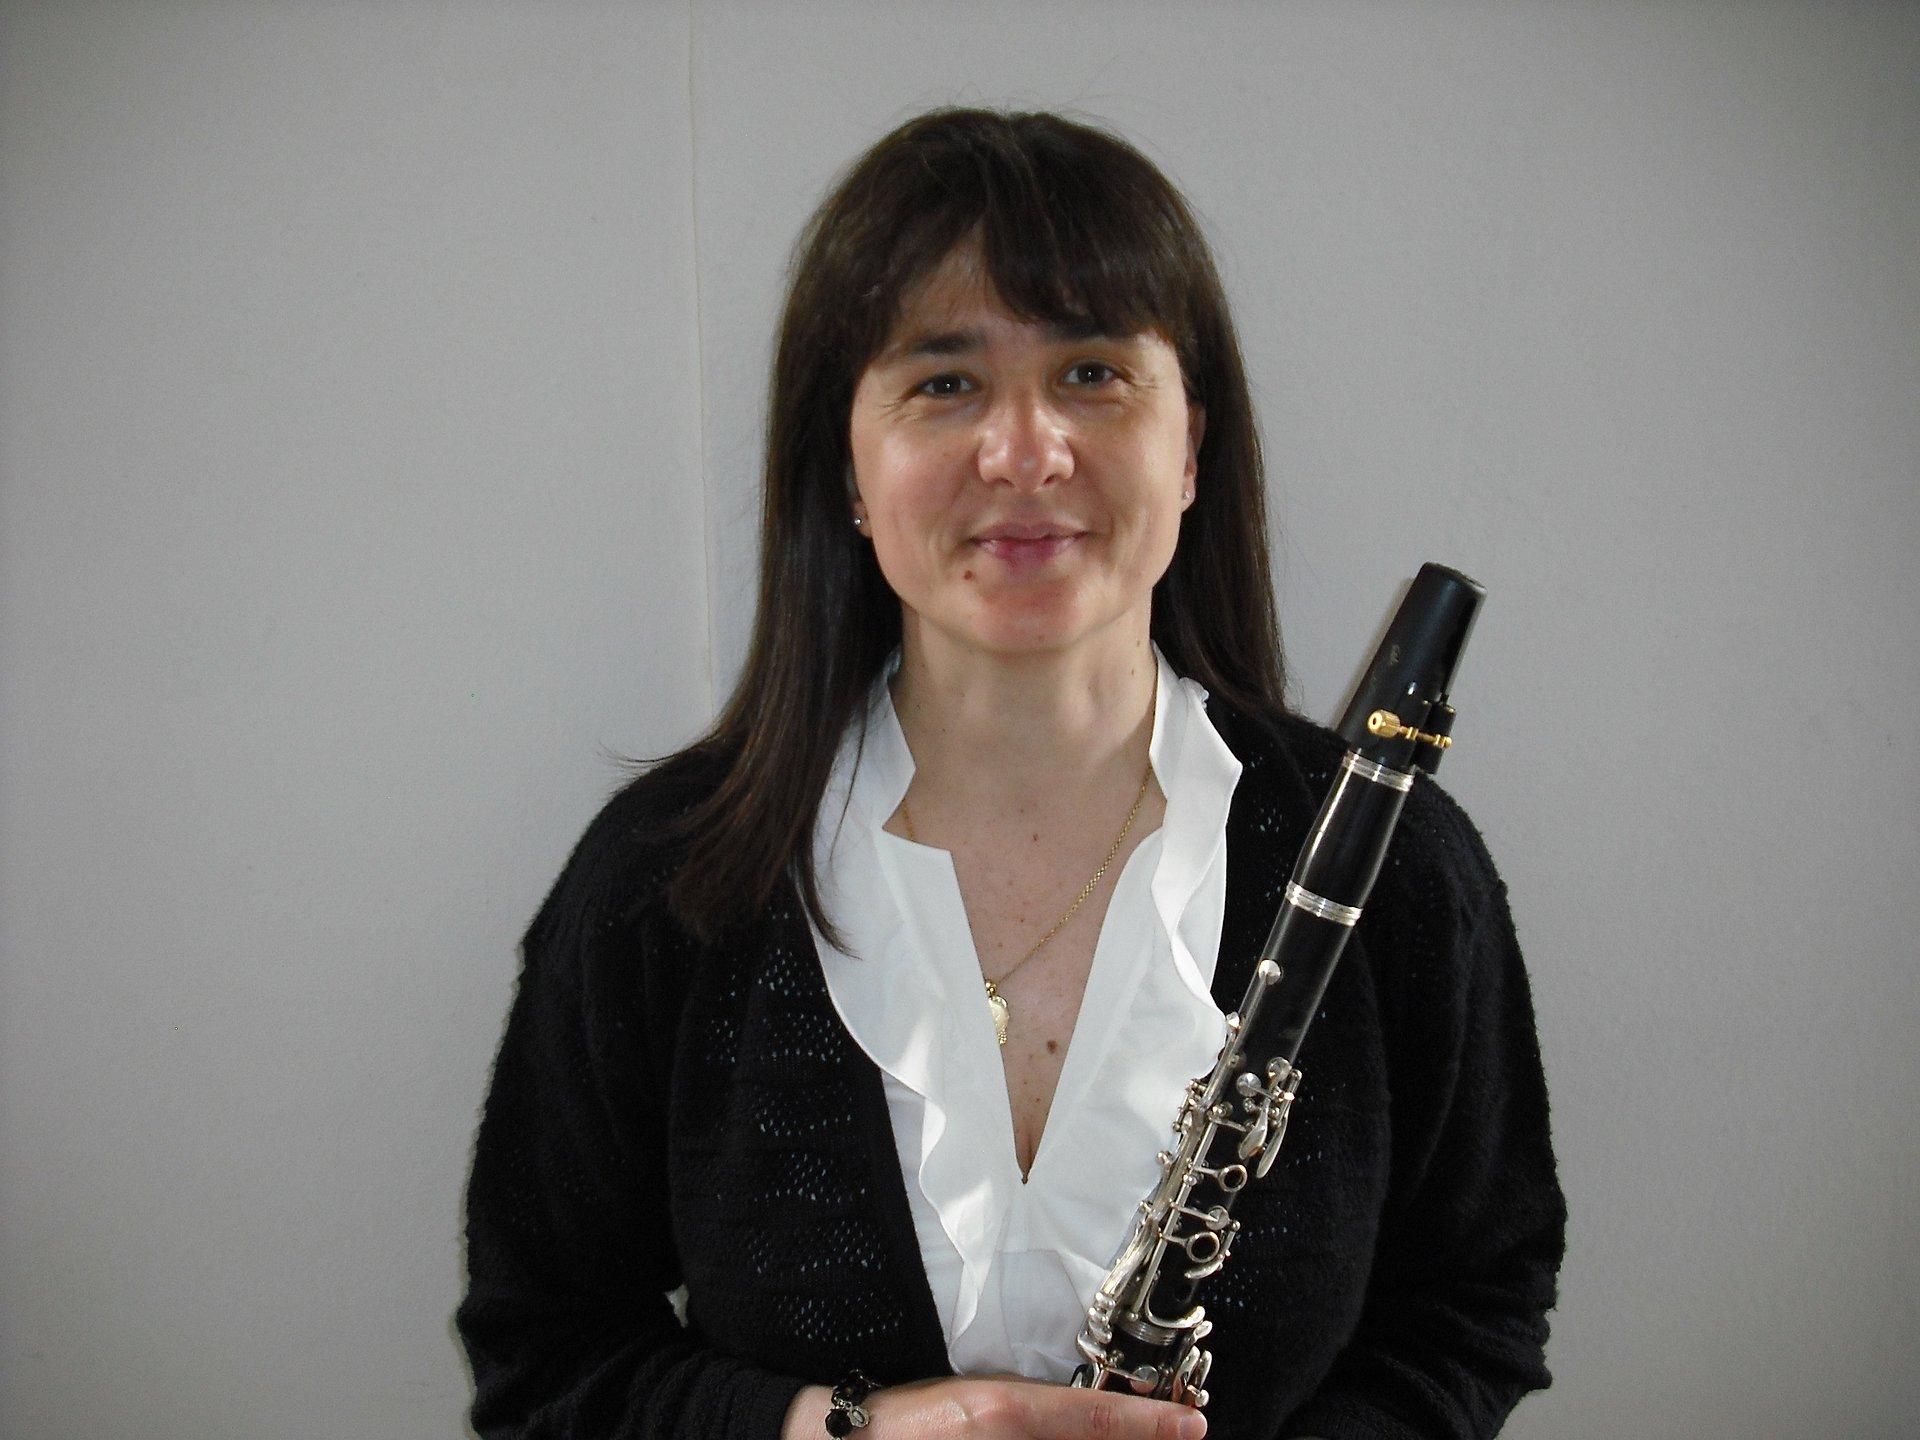 Angela Pilitta